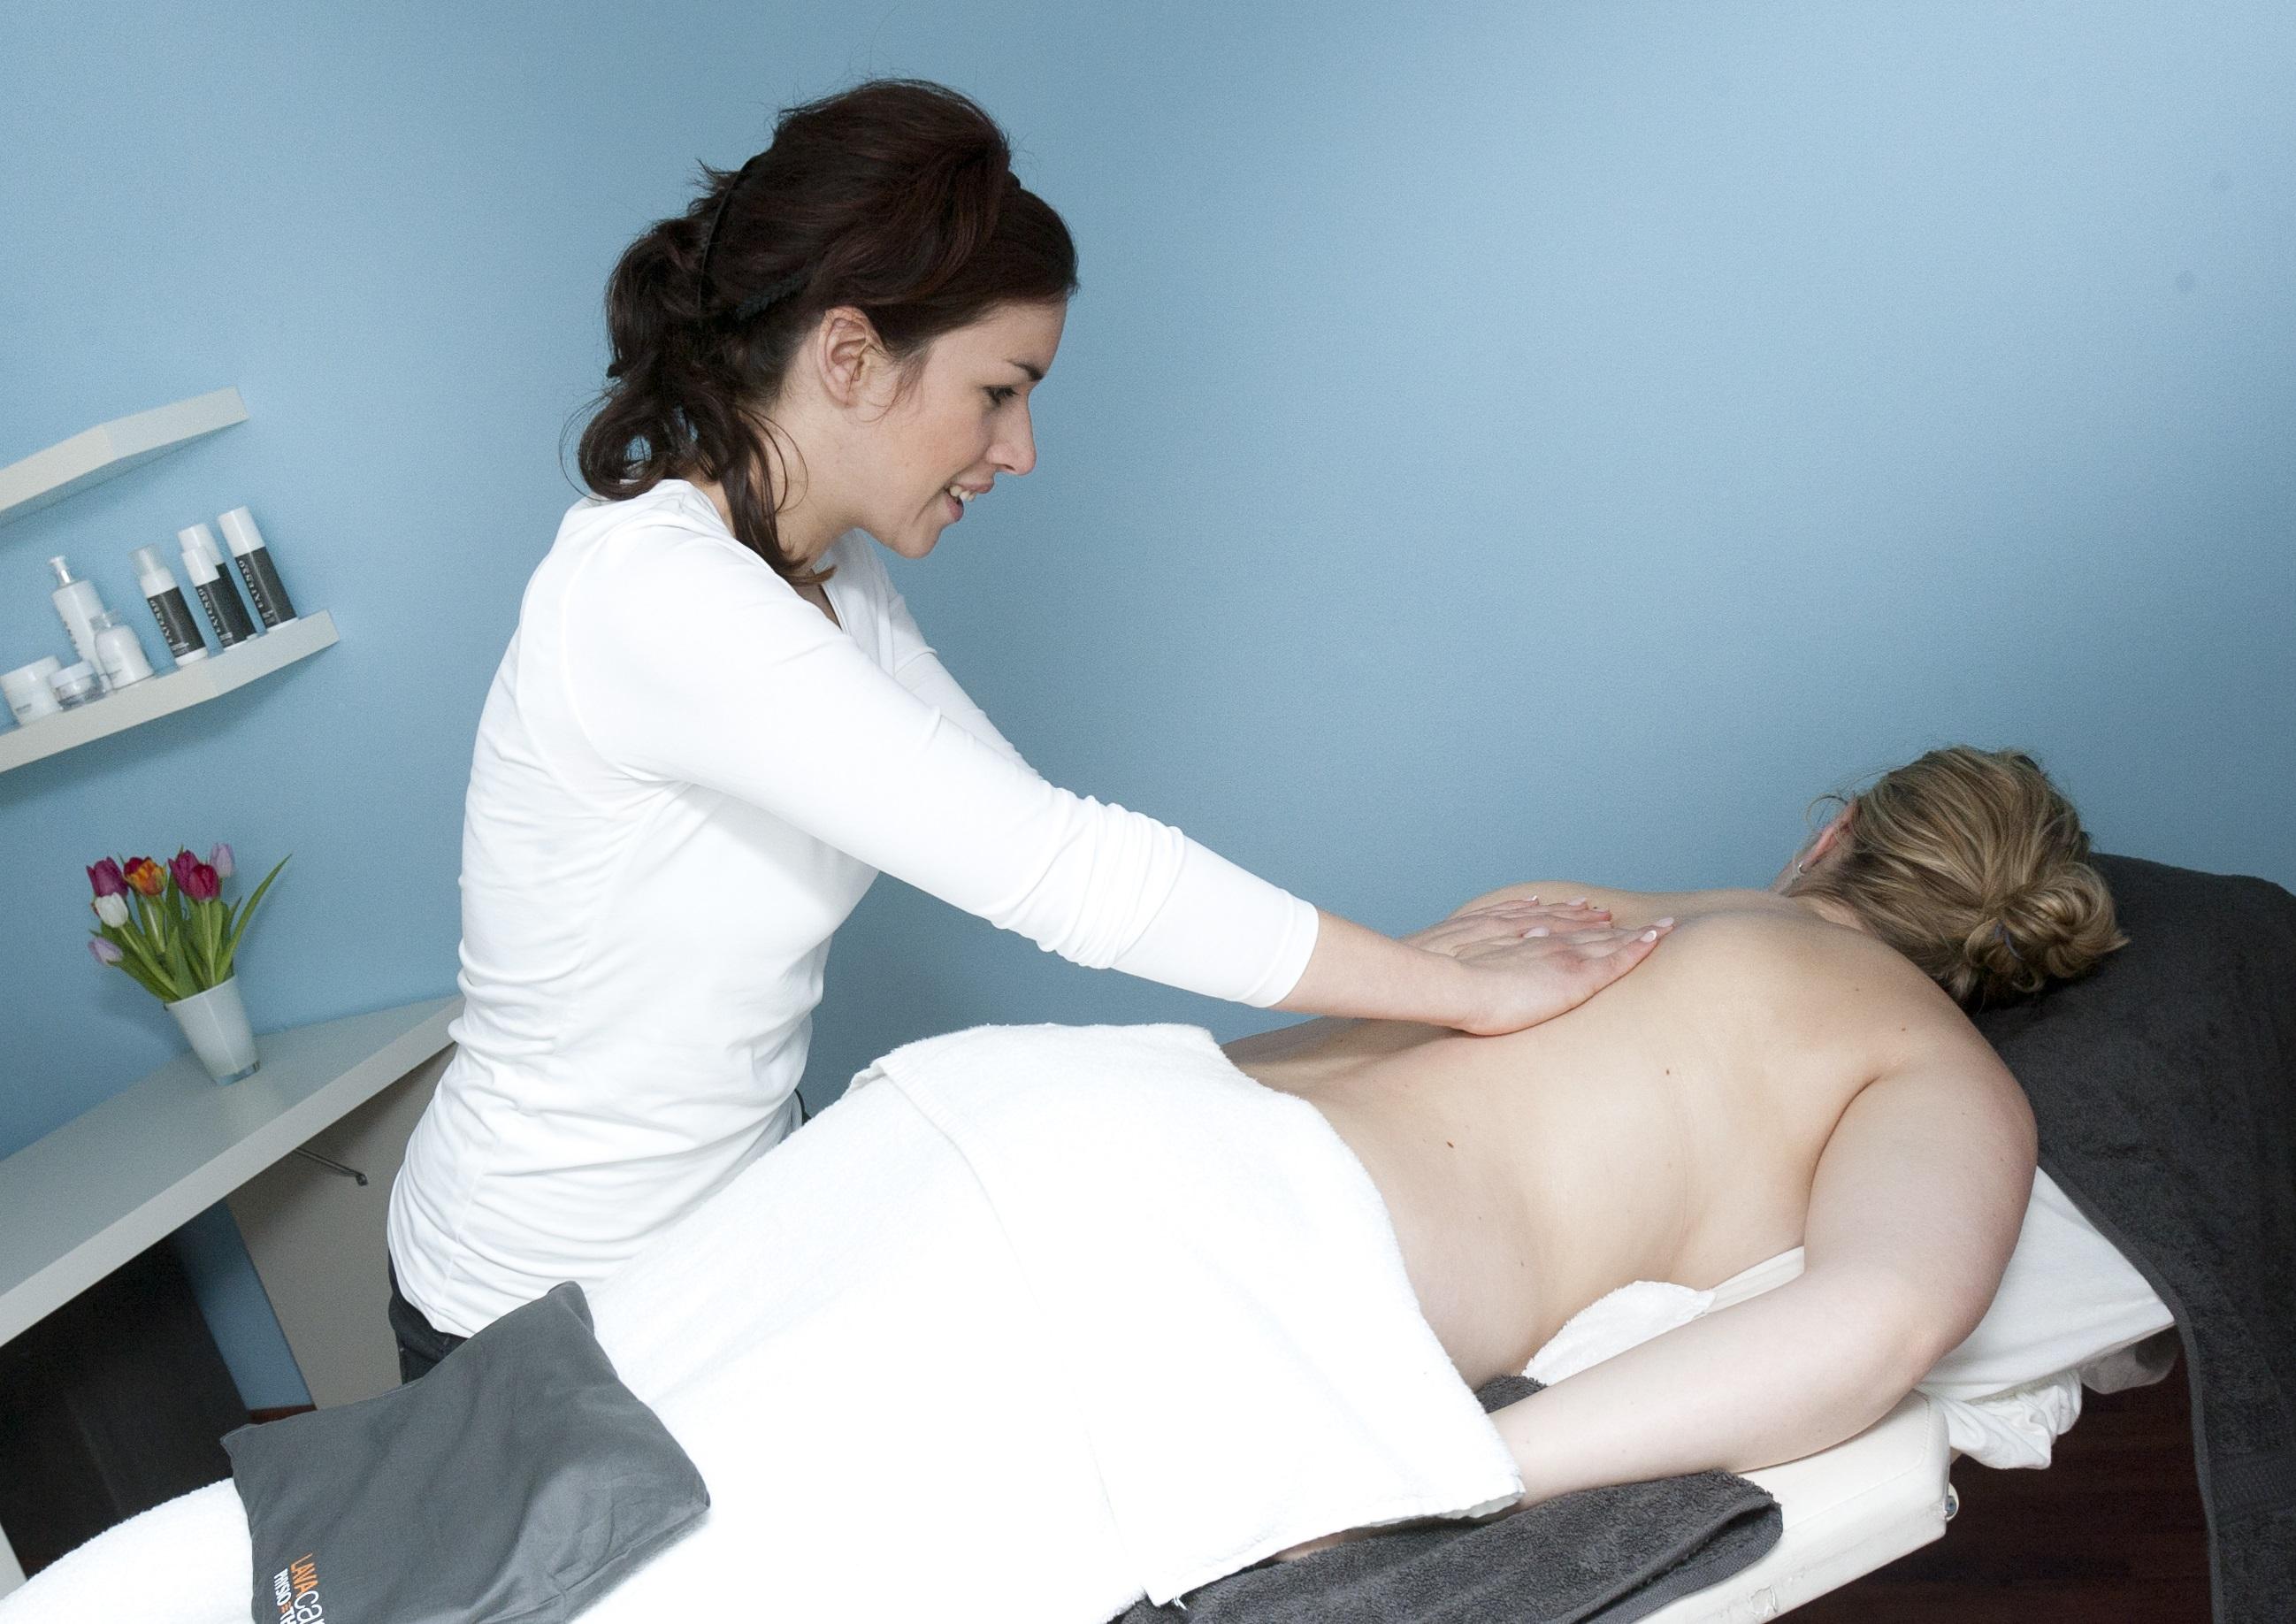 Ontspanningsmassage, shiatsu massage - Natuurlijk Kim Raamsdonksveer Oosterhout Geertruidenberg